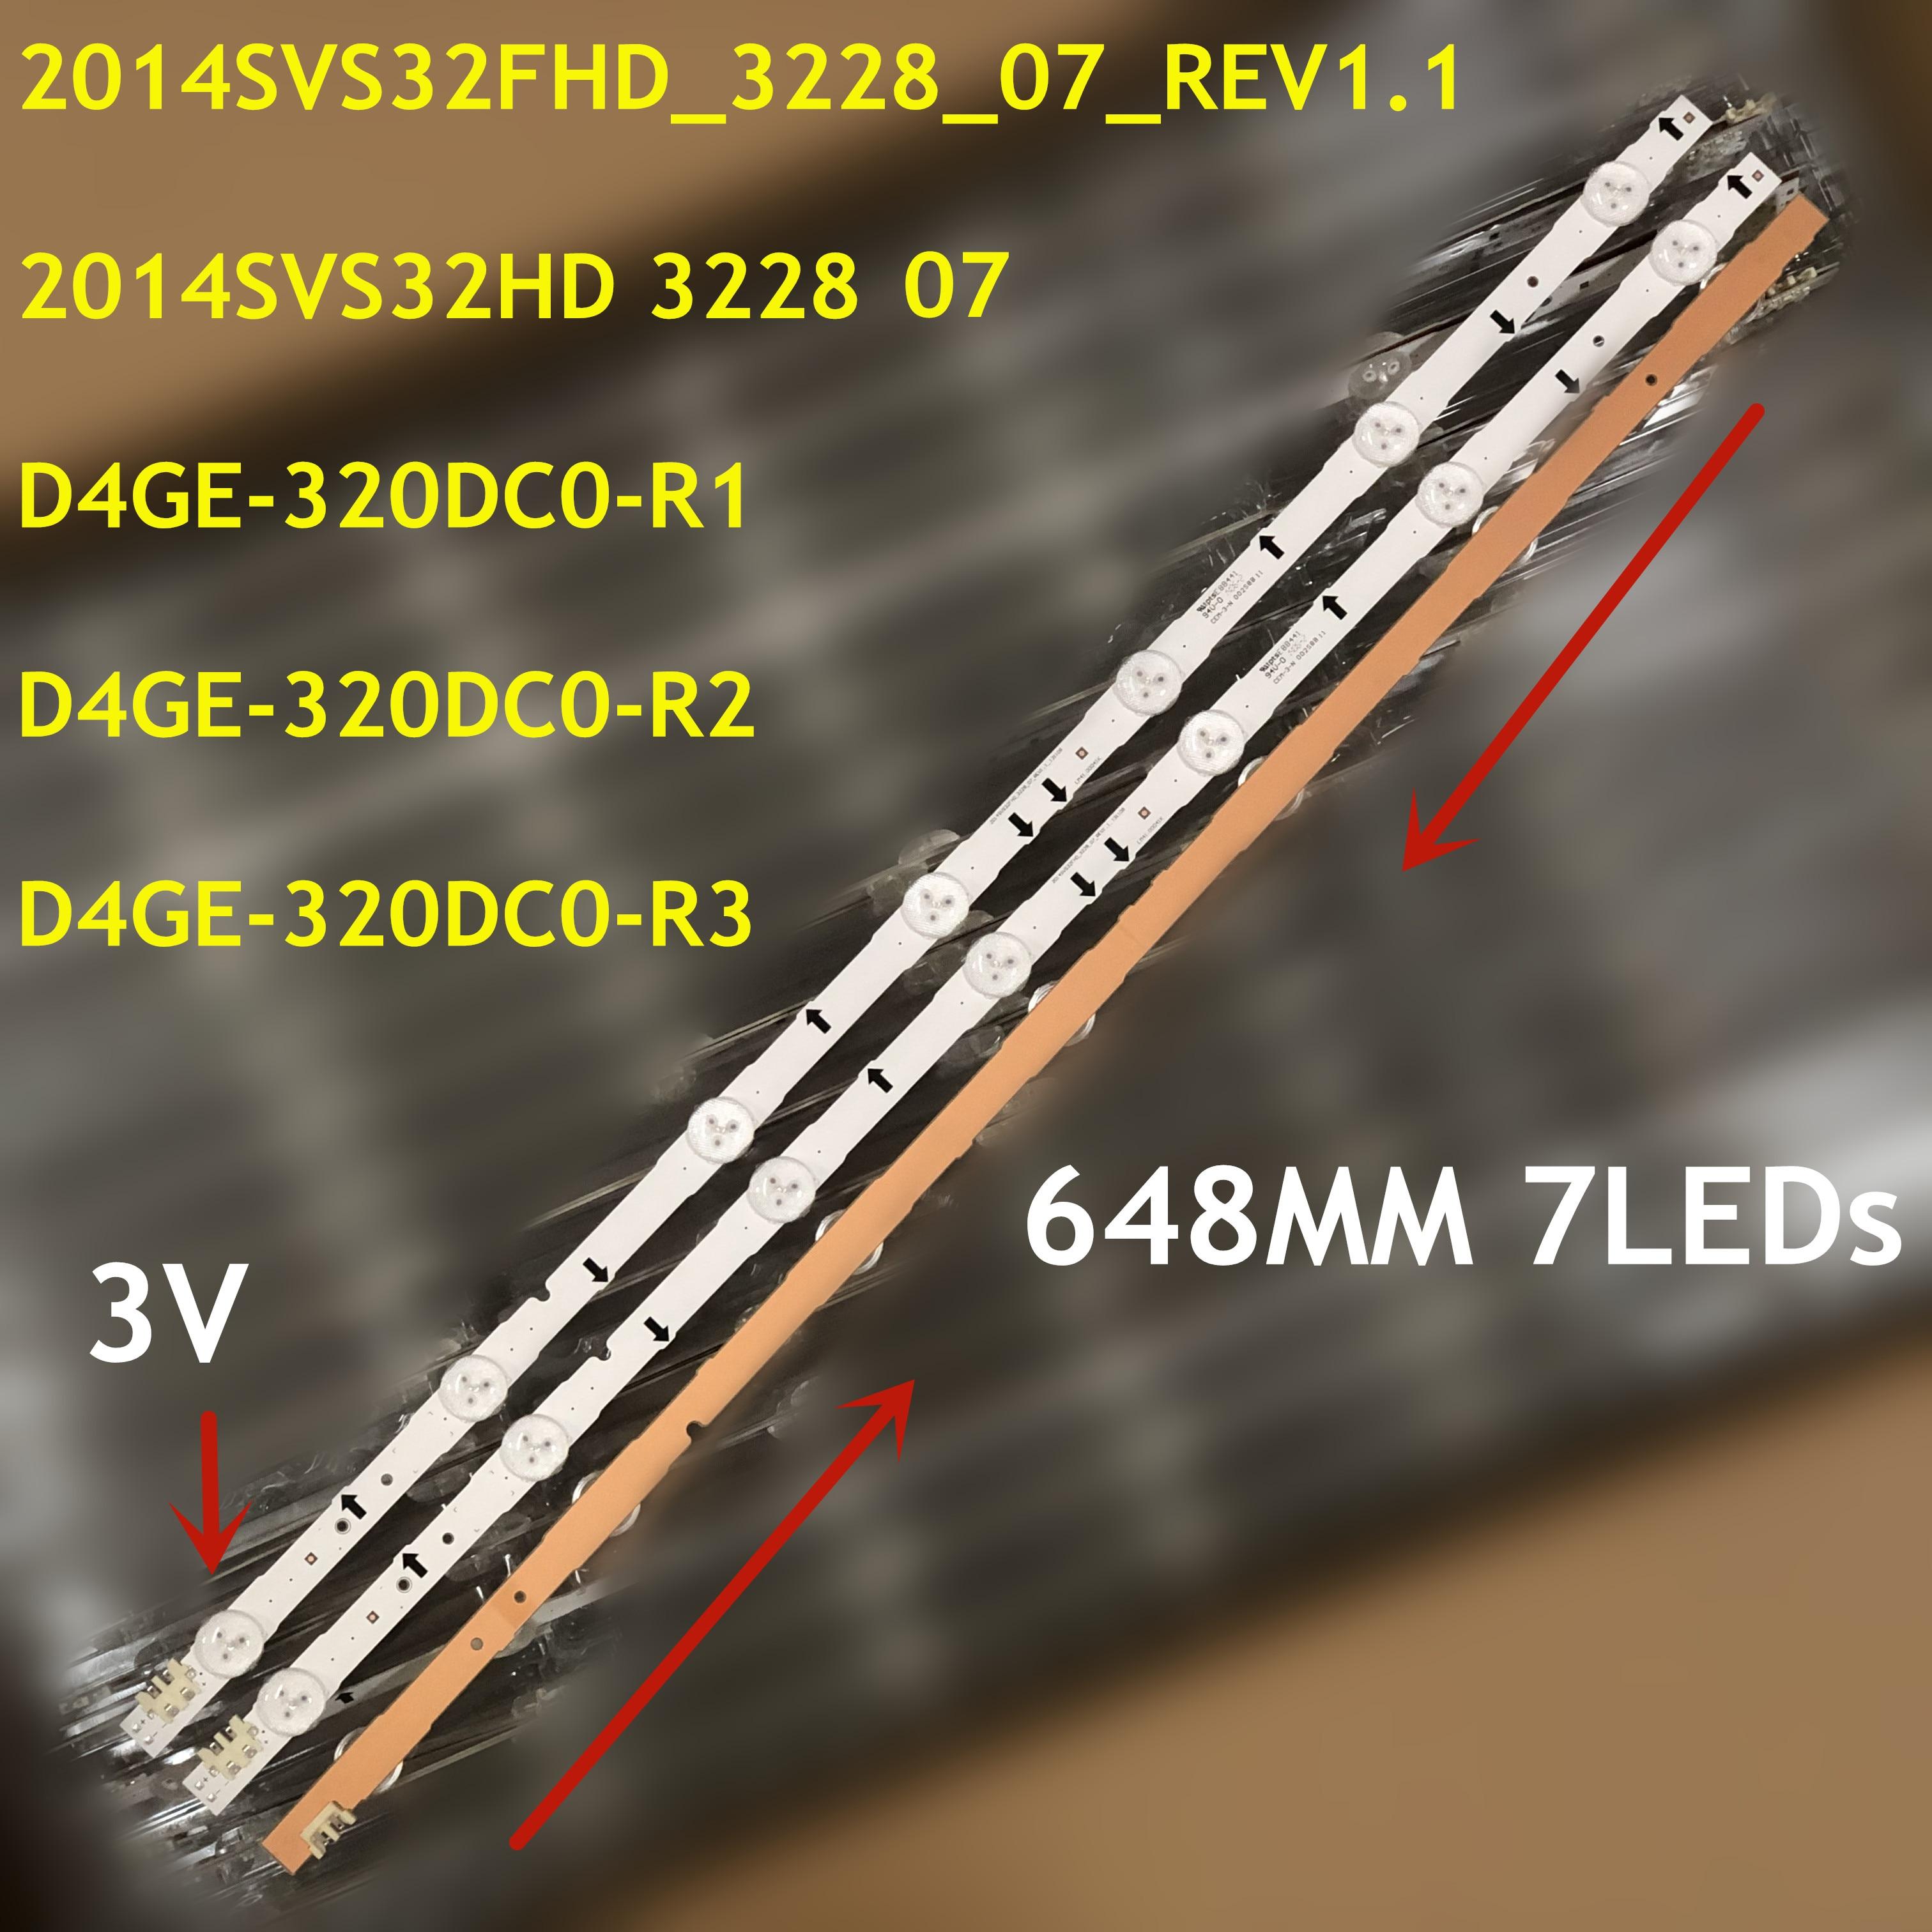 4PCS LED Backlight Para UE32H5000 UE32H5500 UE32J5100 UE32J5500AK UE32H6200 UE32J6300 UA32H5500AJ GH032BGA-B2 D4GE-320DC1-R1 R2